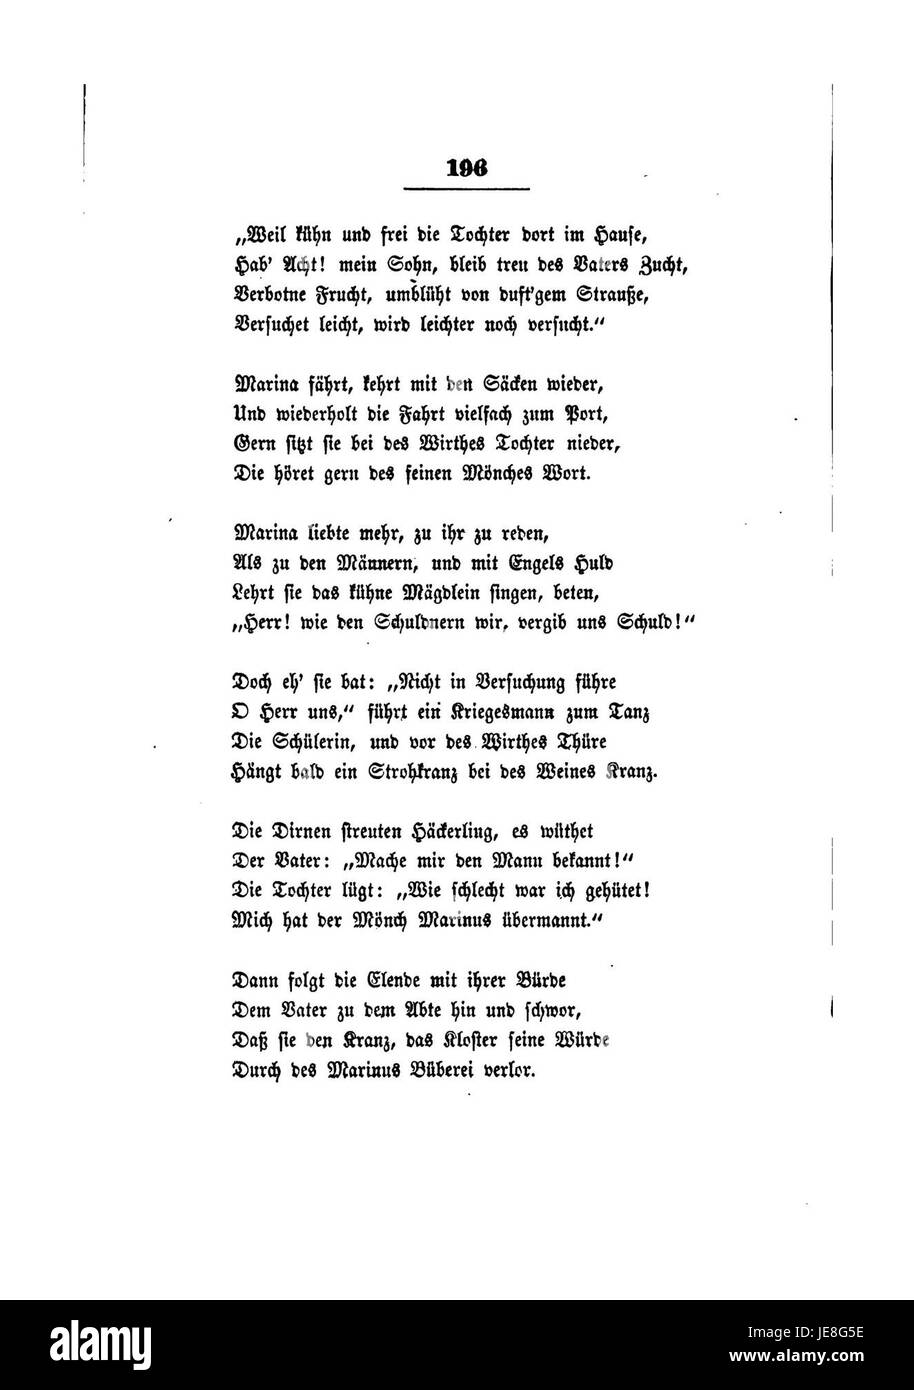 Clemens Brentanos Gesammelte Schriften I 196 Stock Photo